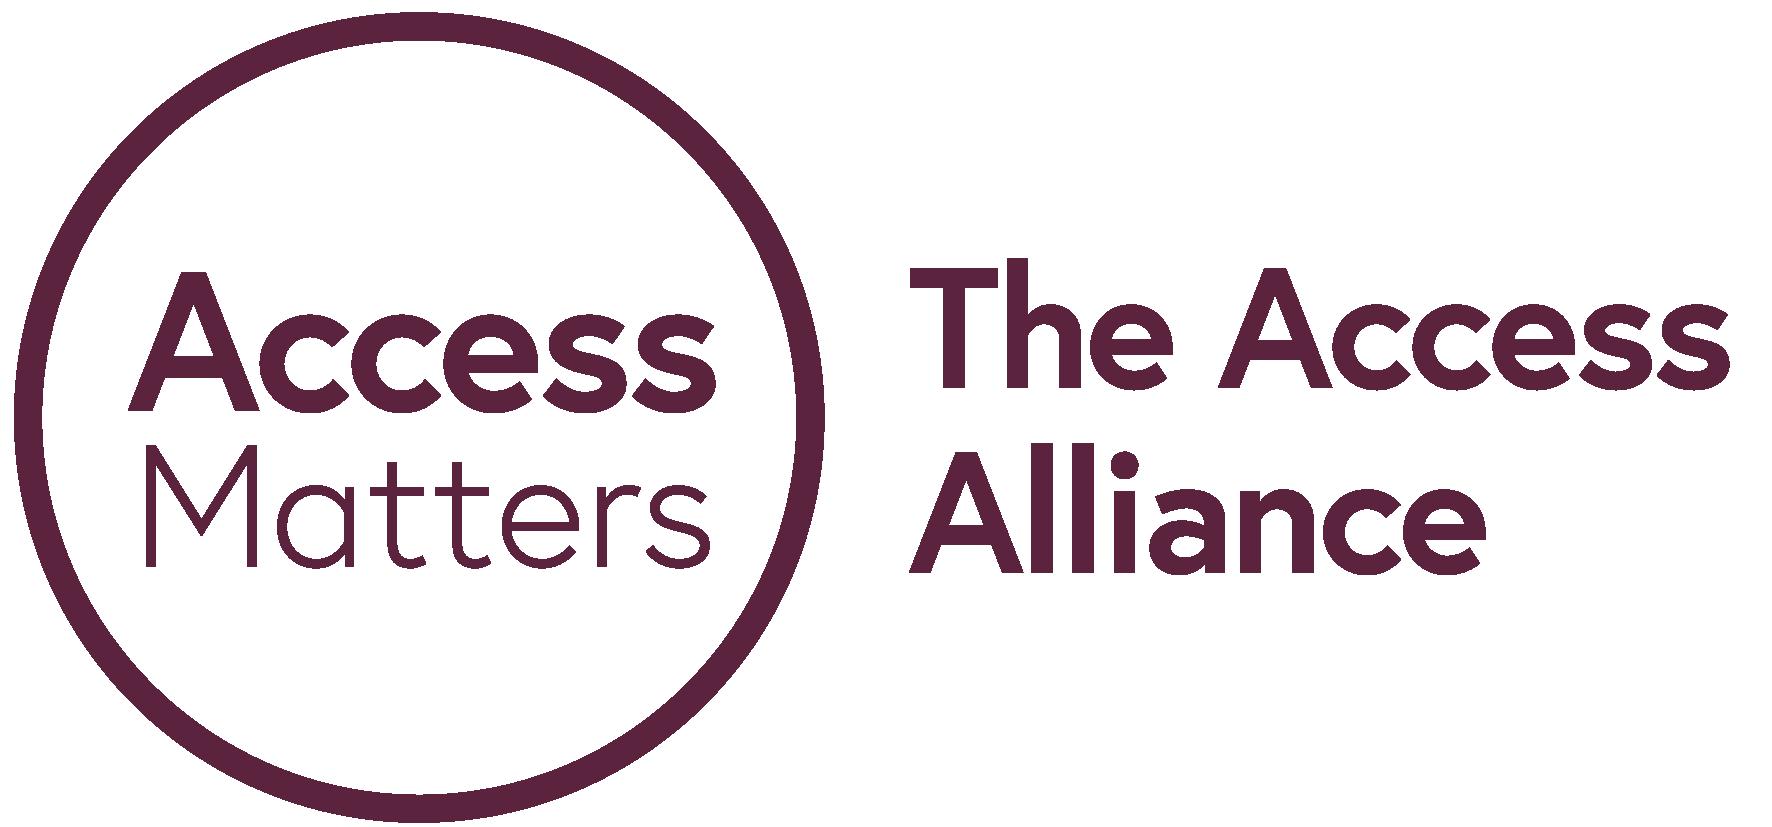 Access Matters: The Access Alliance logo